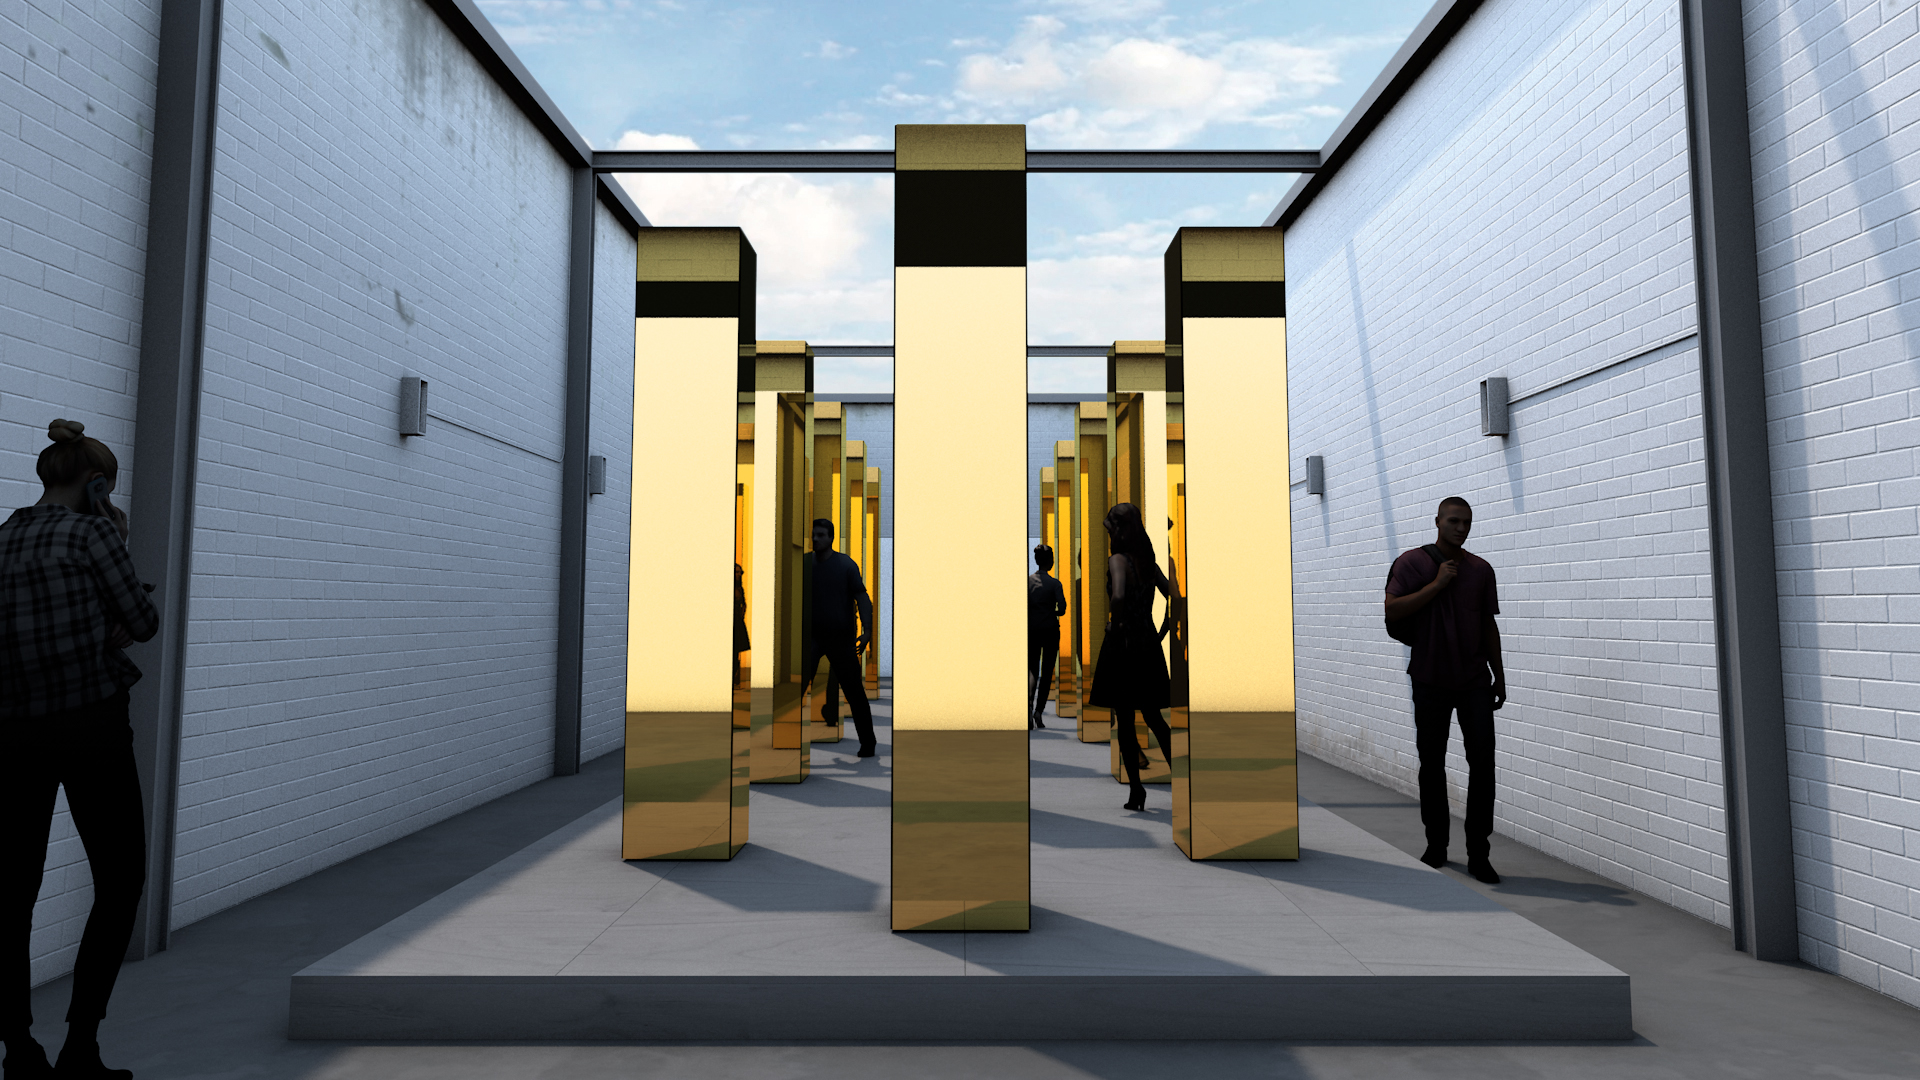 Reflective columns